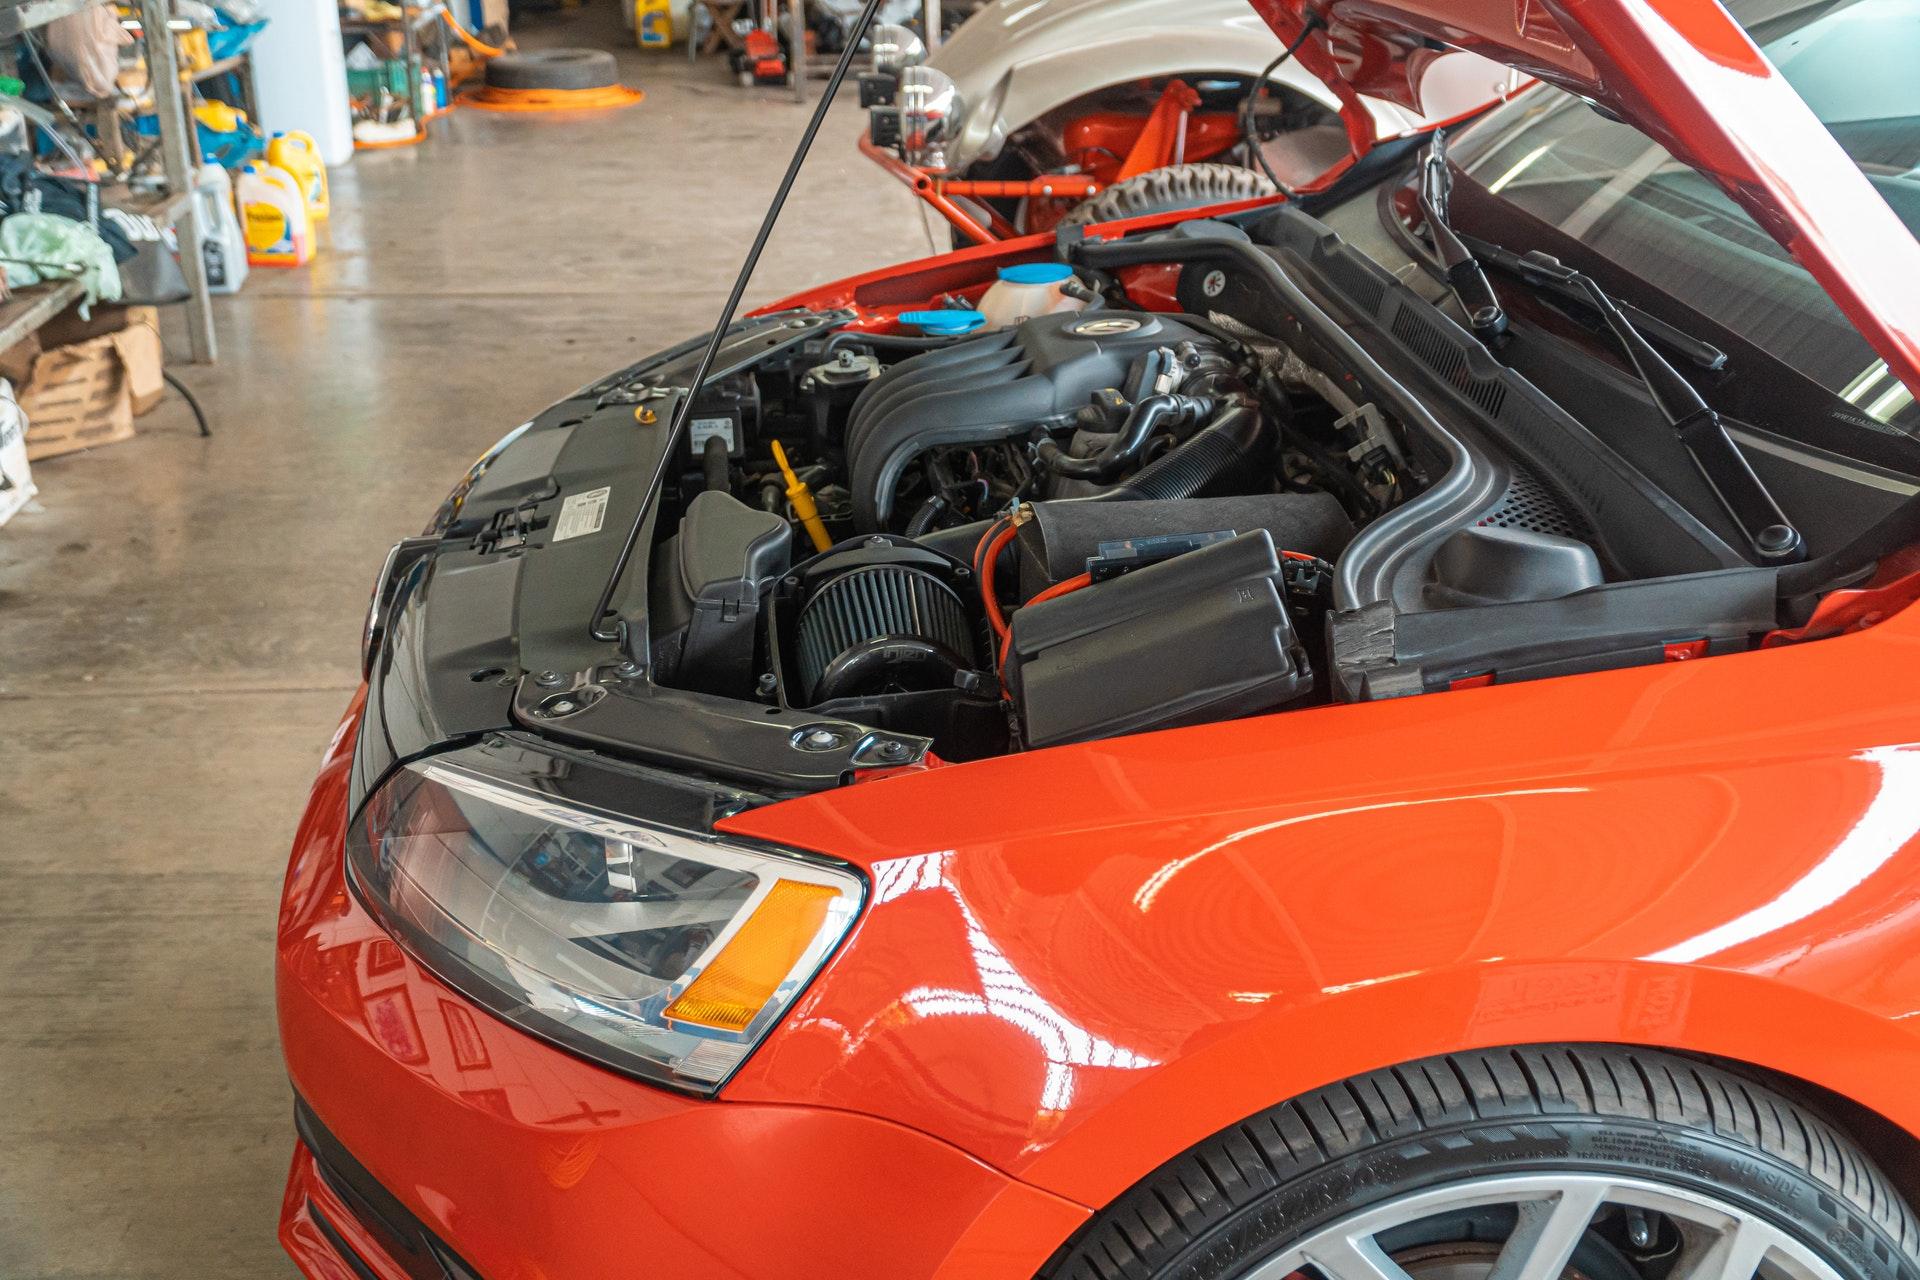 Turbodieselmotoren en chipping van auto